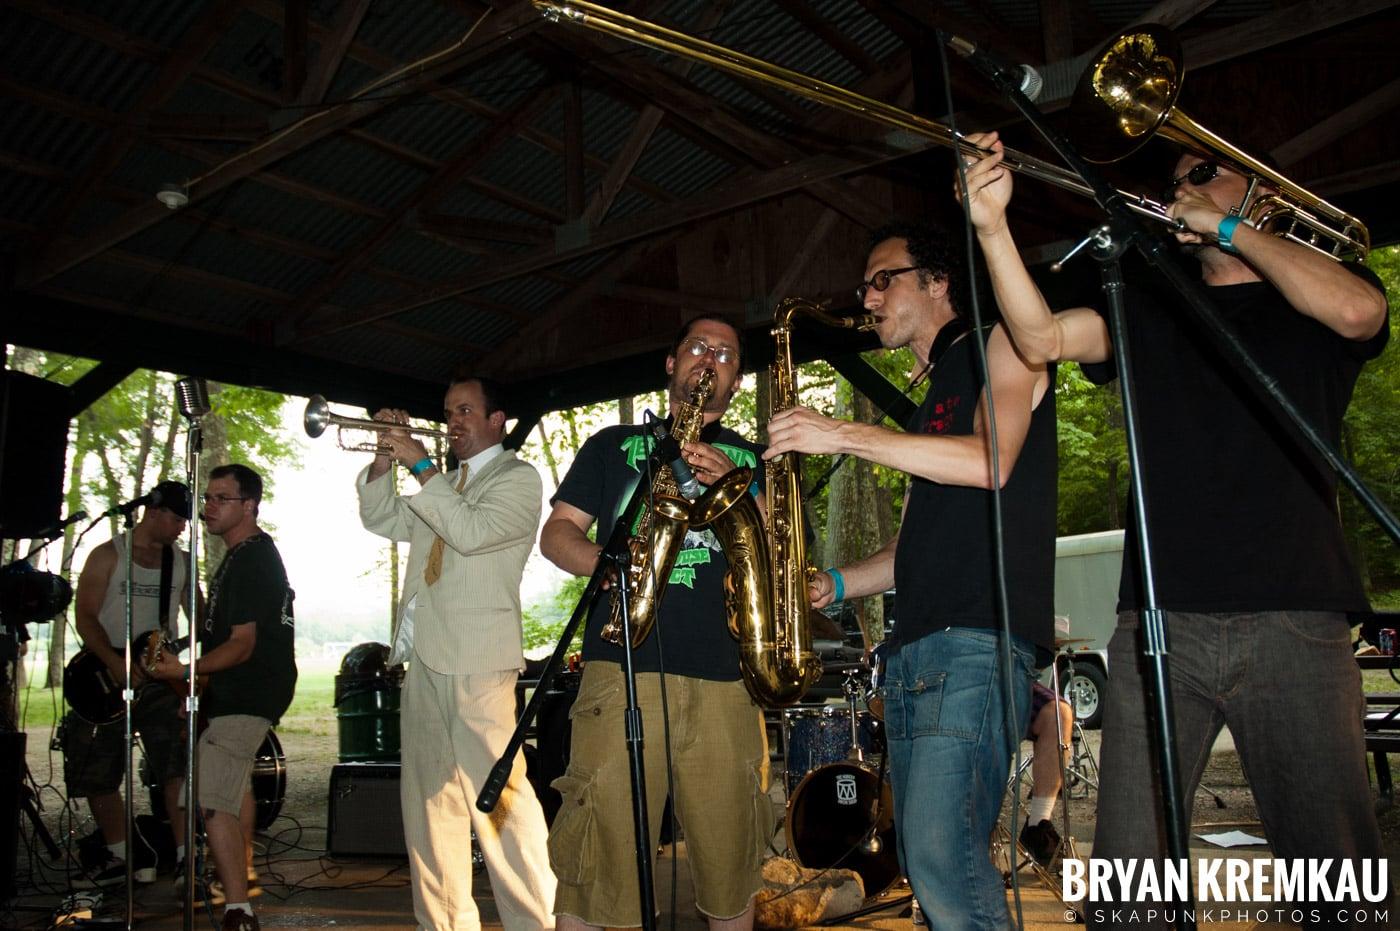 Tri-State Conspiracy @ The Big Orange Bonanza, Circleville, NY - 6.2.07 (10)